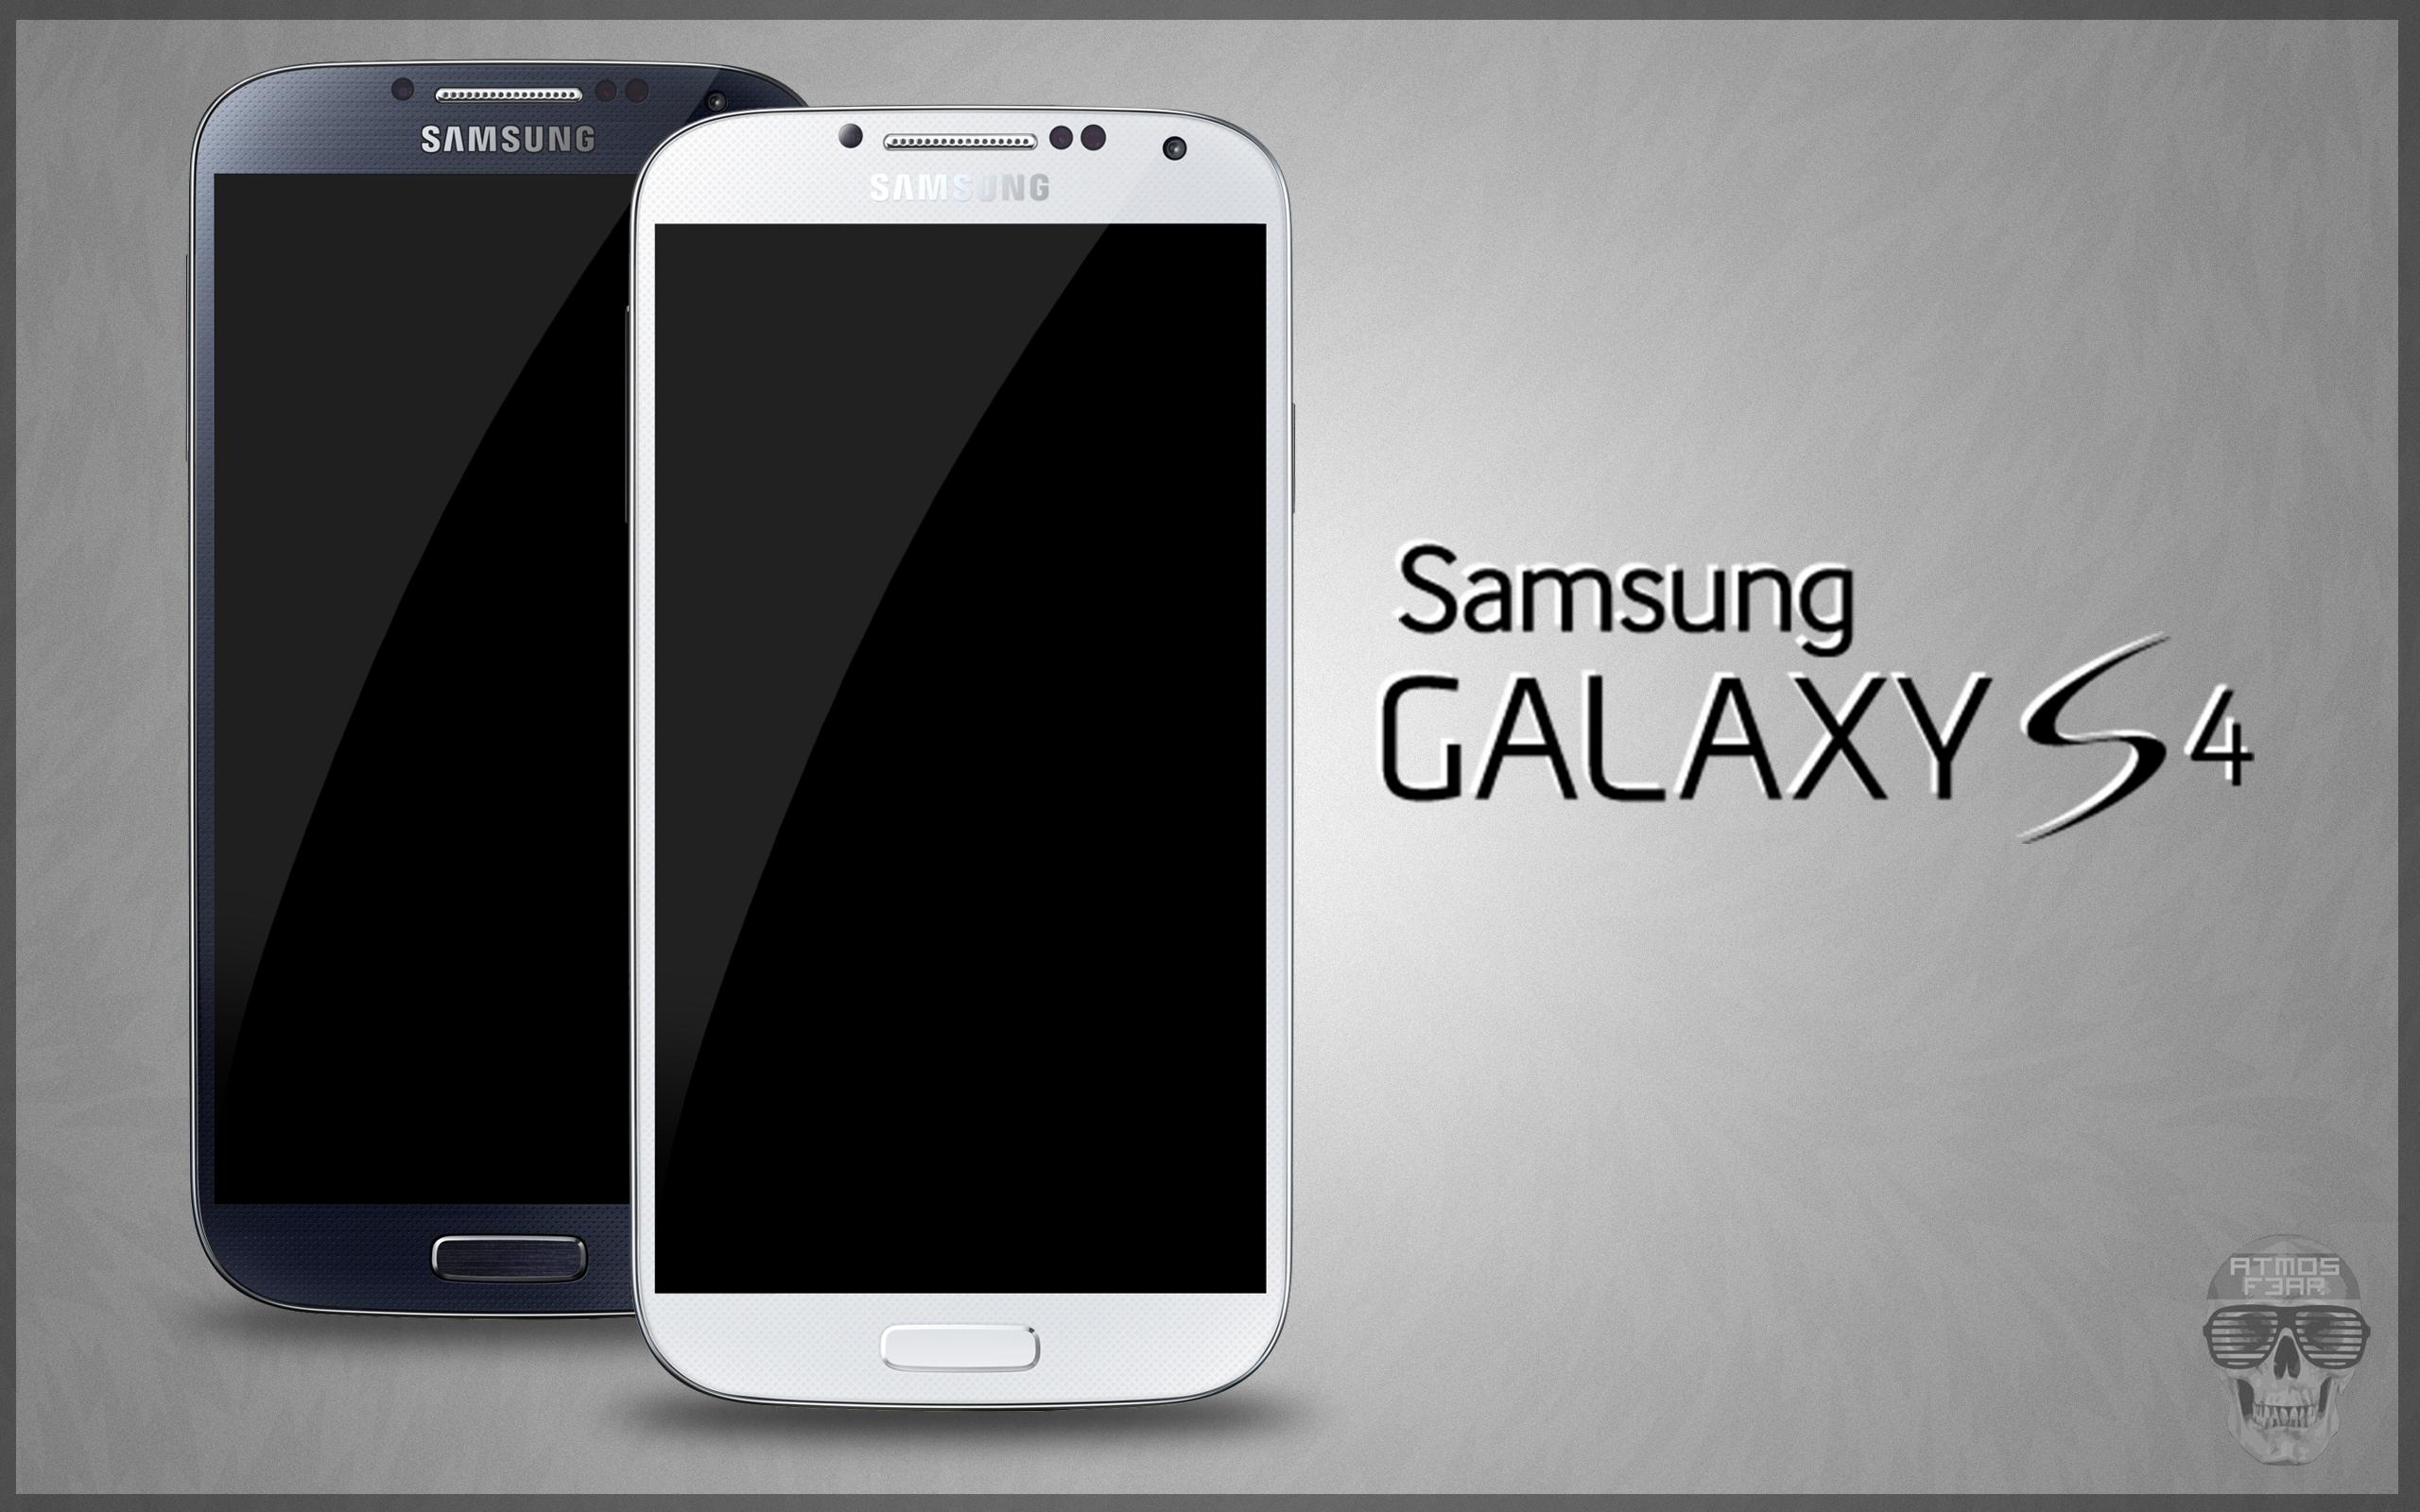 Samsung Galaxy S4 PSD Black White by danishprakash